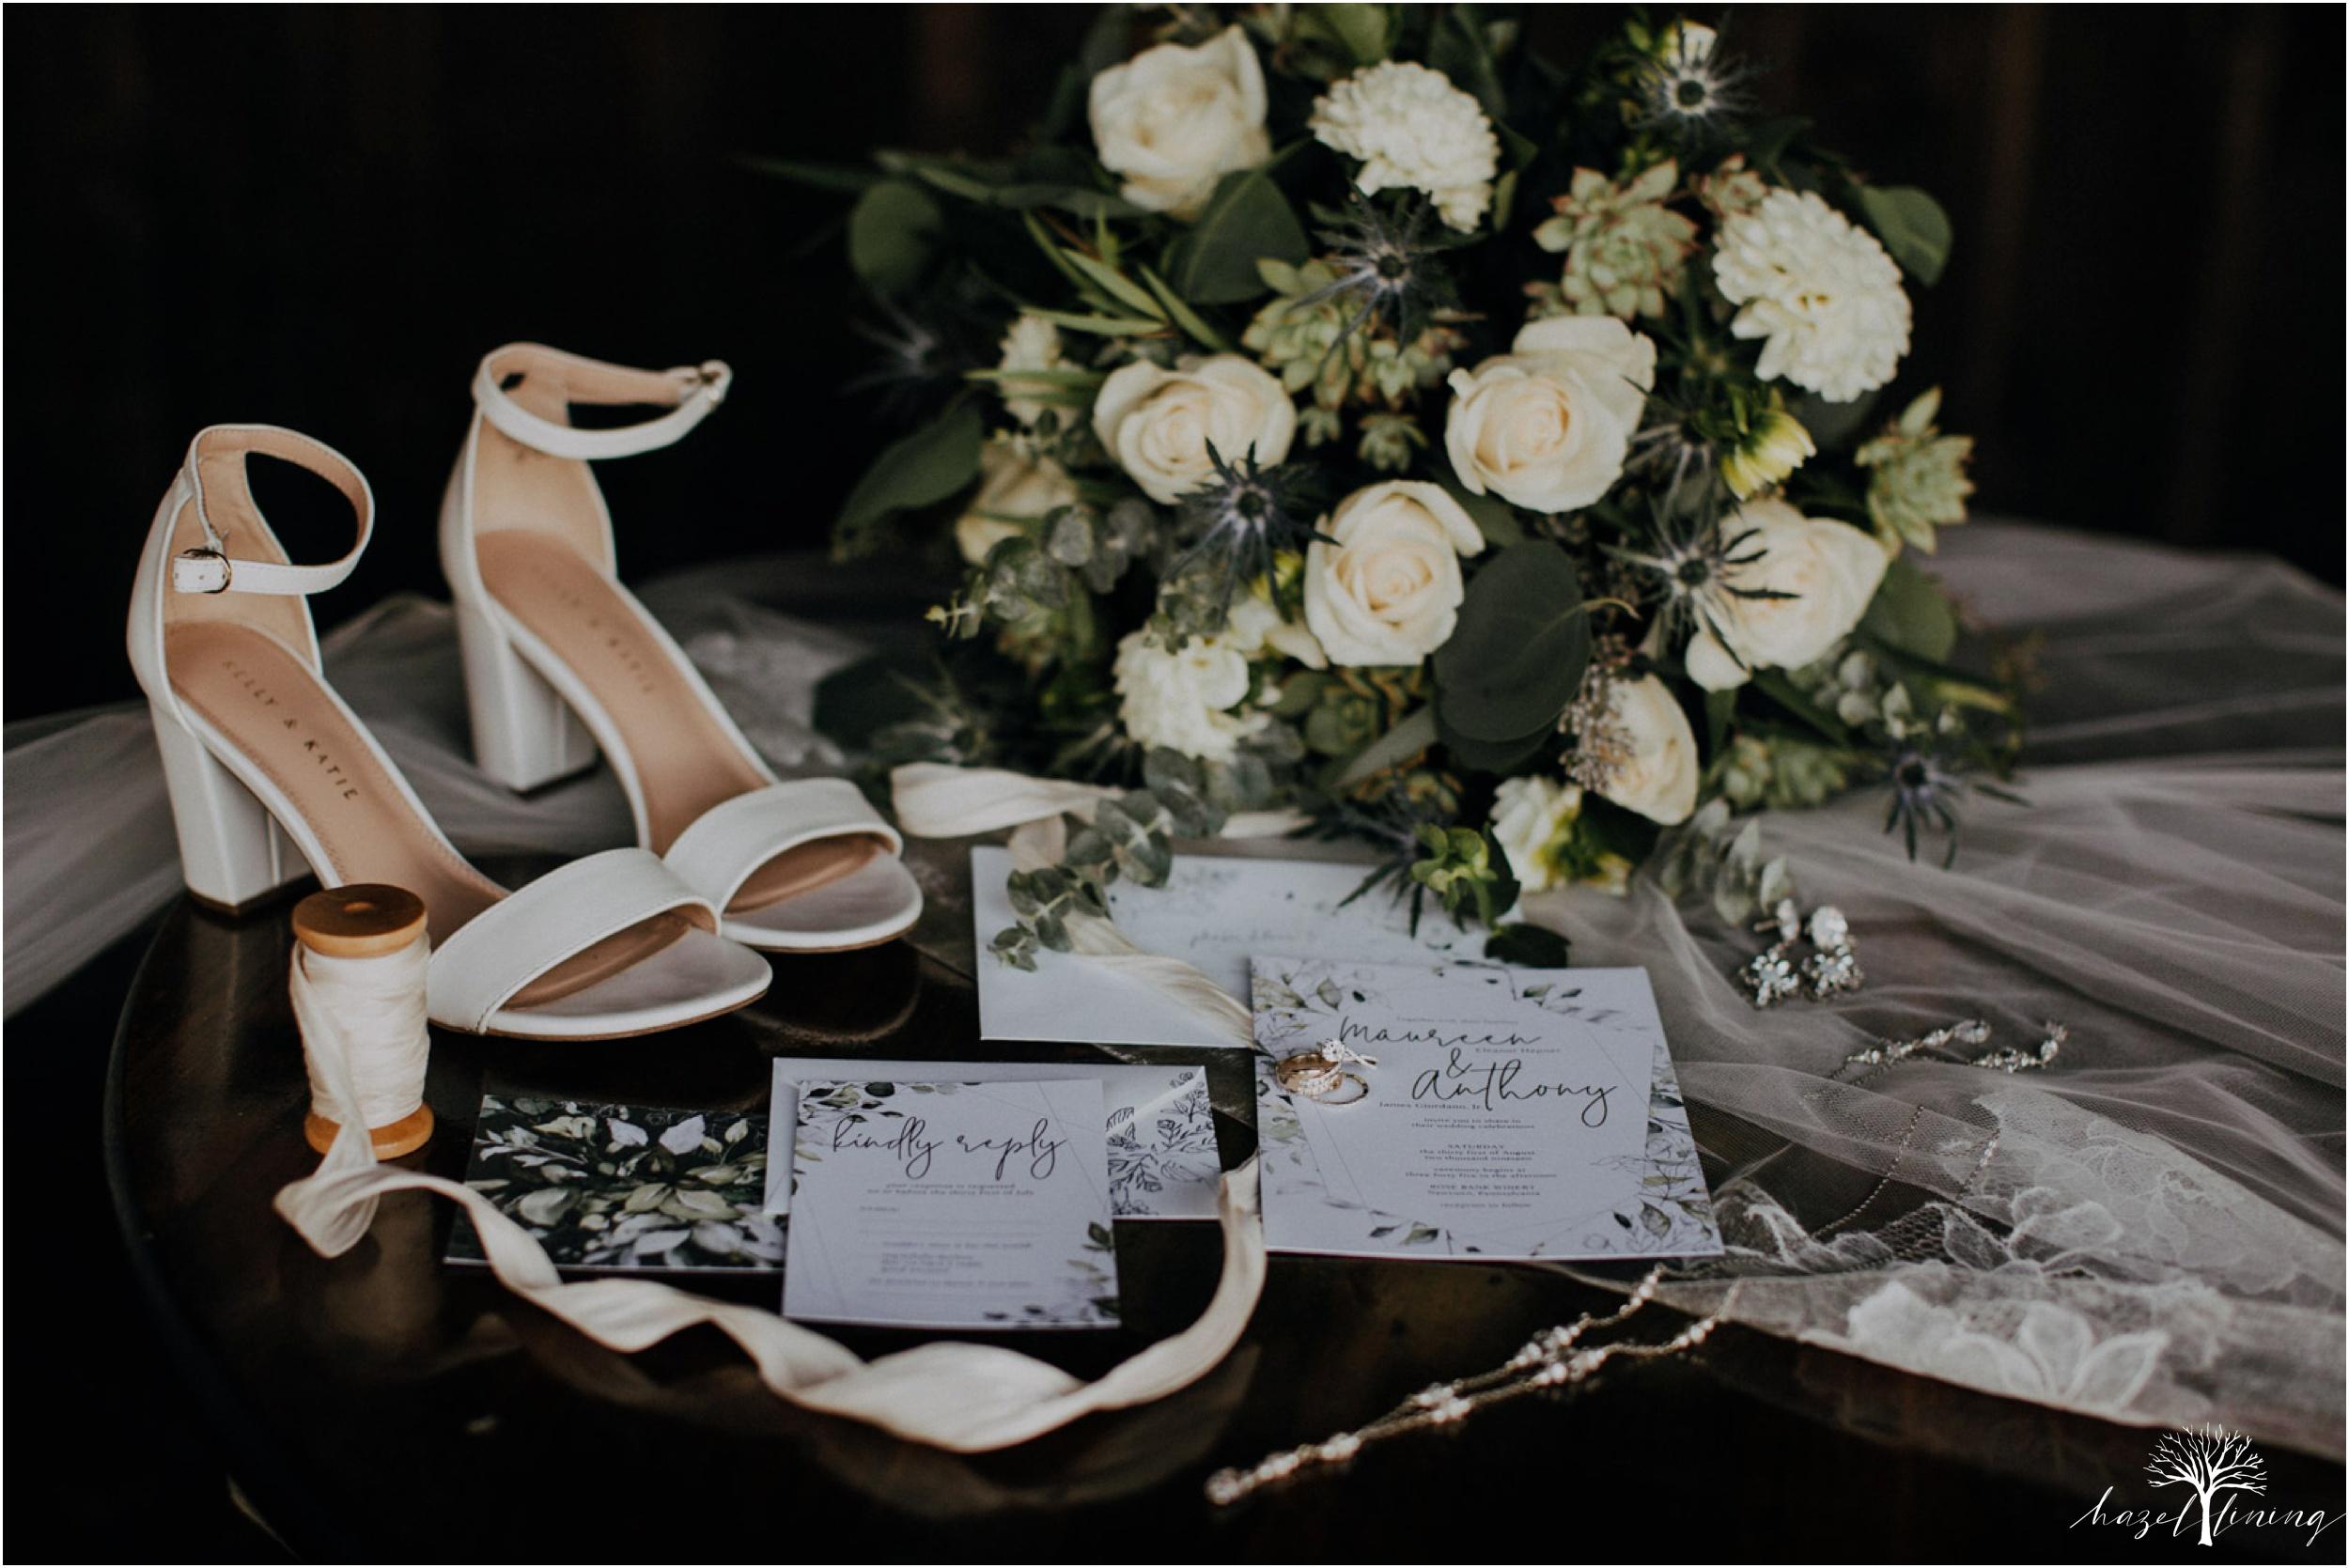 maureen-hepner-anthony-giordano-rose-bank-winery-newtow-pennsylvania-luxury-summer-wedding-hazel-lining-photography-destination-elopement-wedding-engagement-photography_0003.jpg